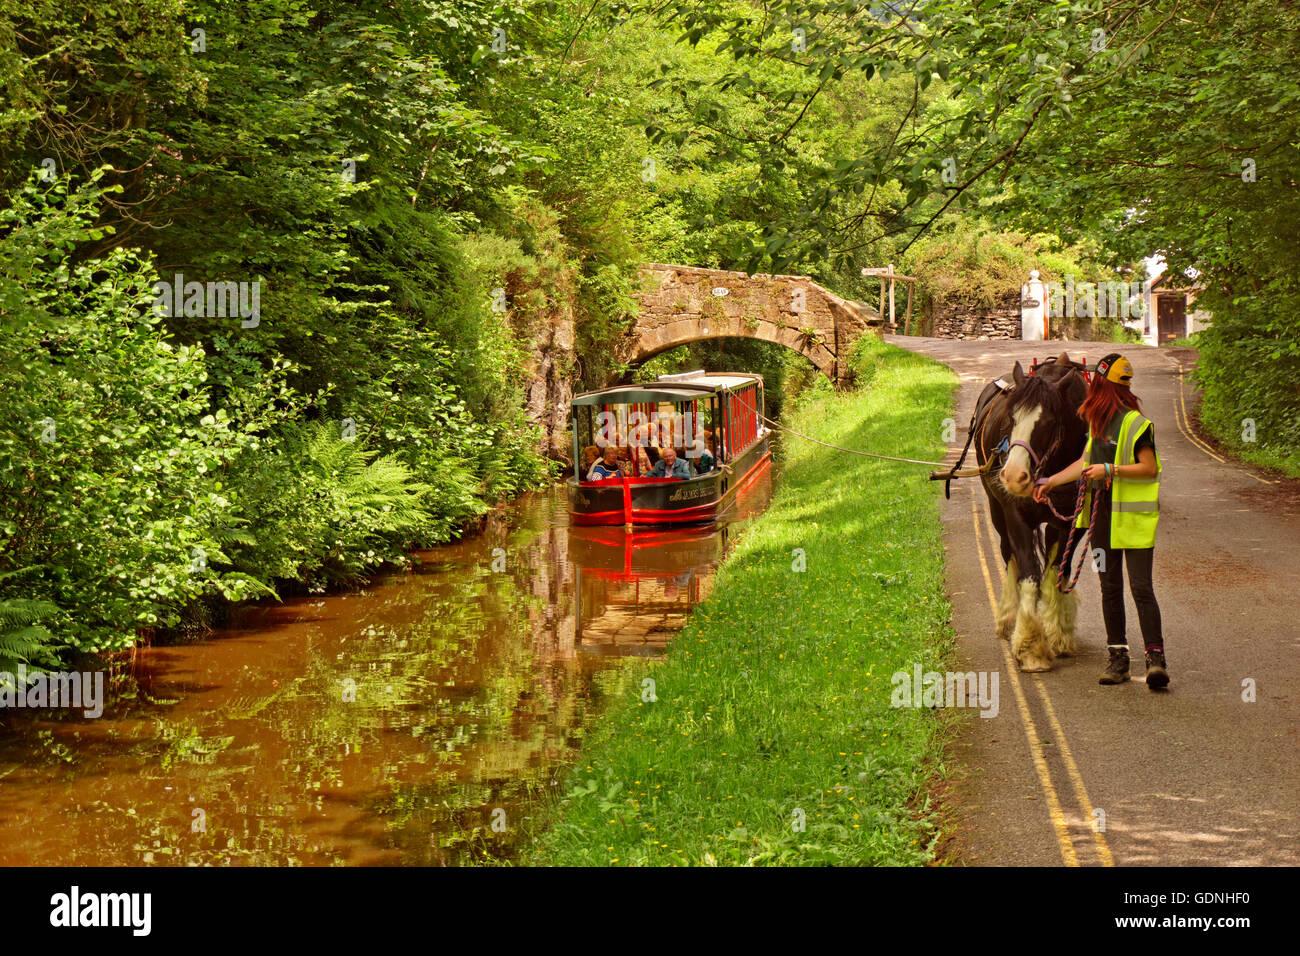 Horse drawn tourism barge on the upper Llangollen Canal near the Horseshoe Falls at Llangollen, Denbighshire, Wales - Stock Image